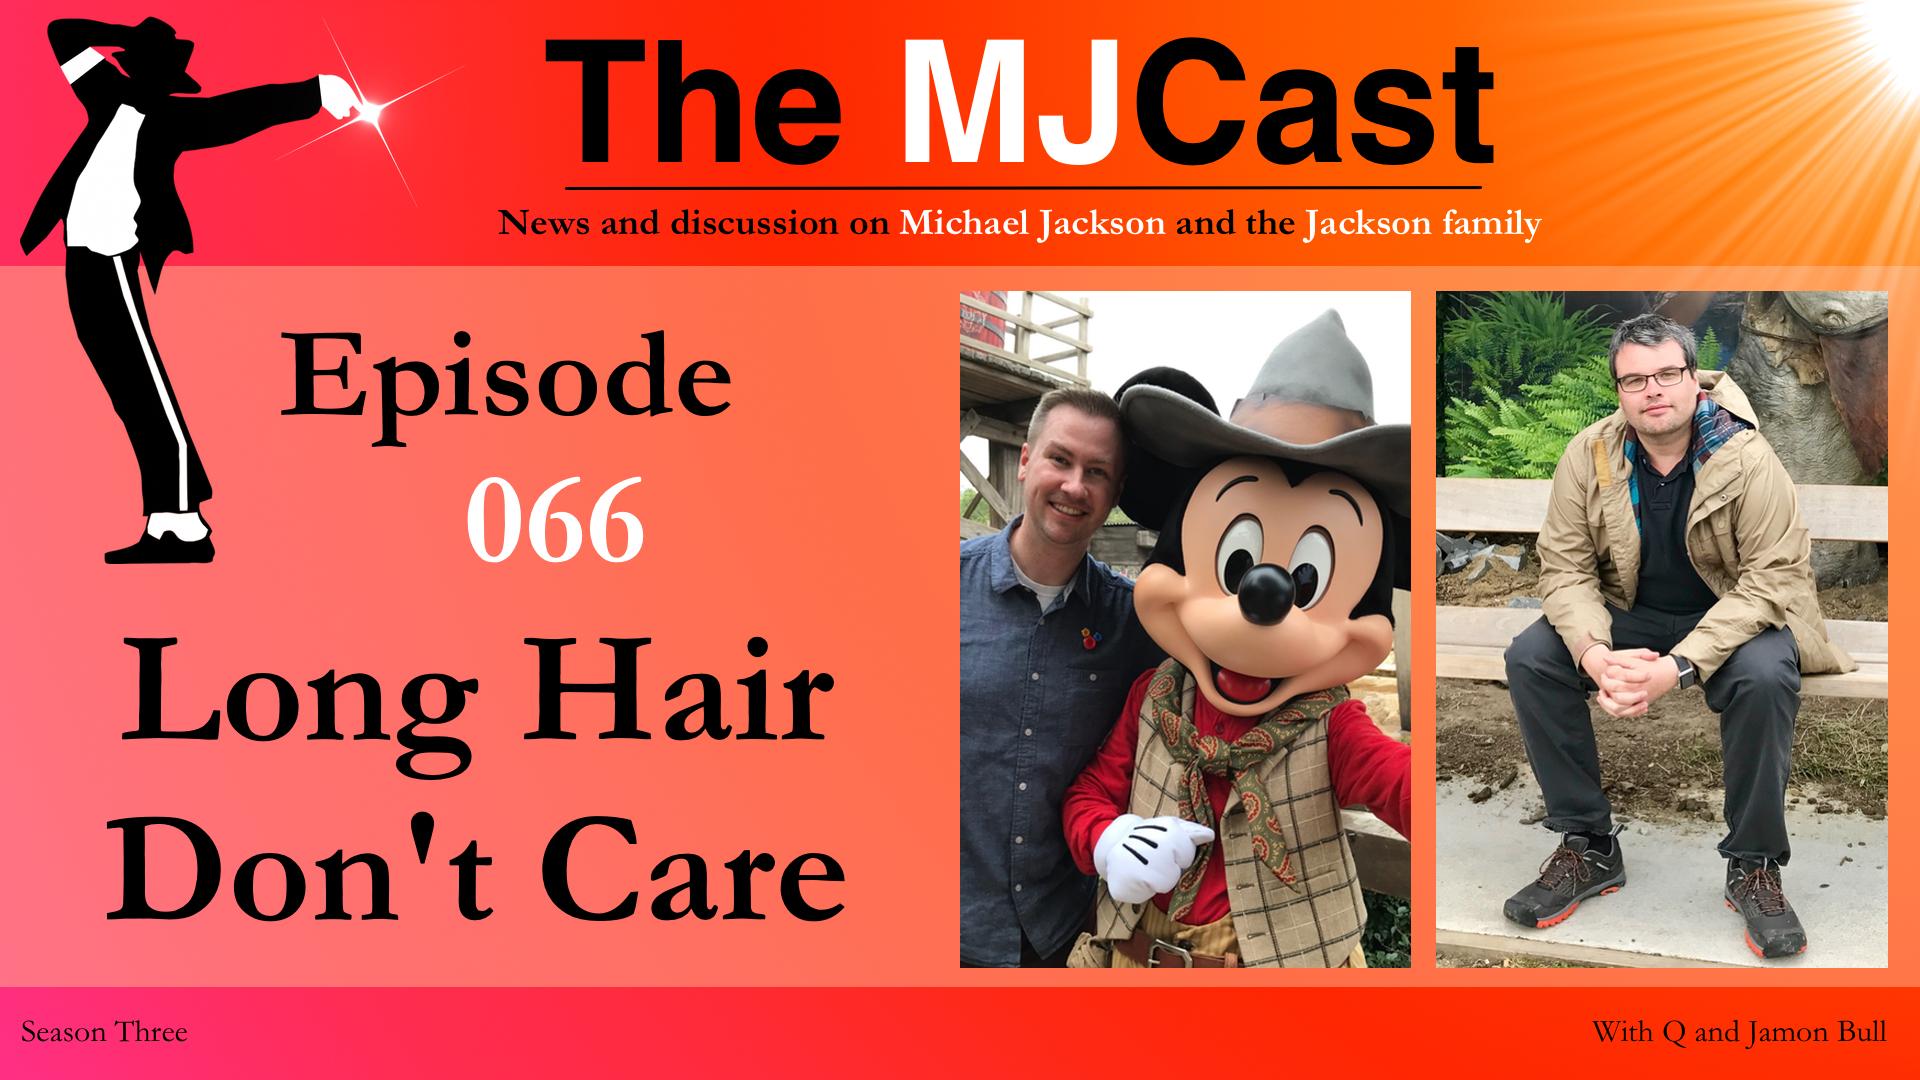 Episode 066 - Long Hair Don't Care The MJCast - A Michael